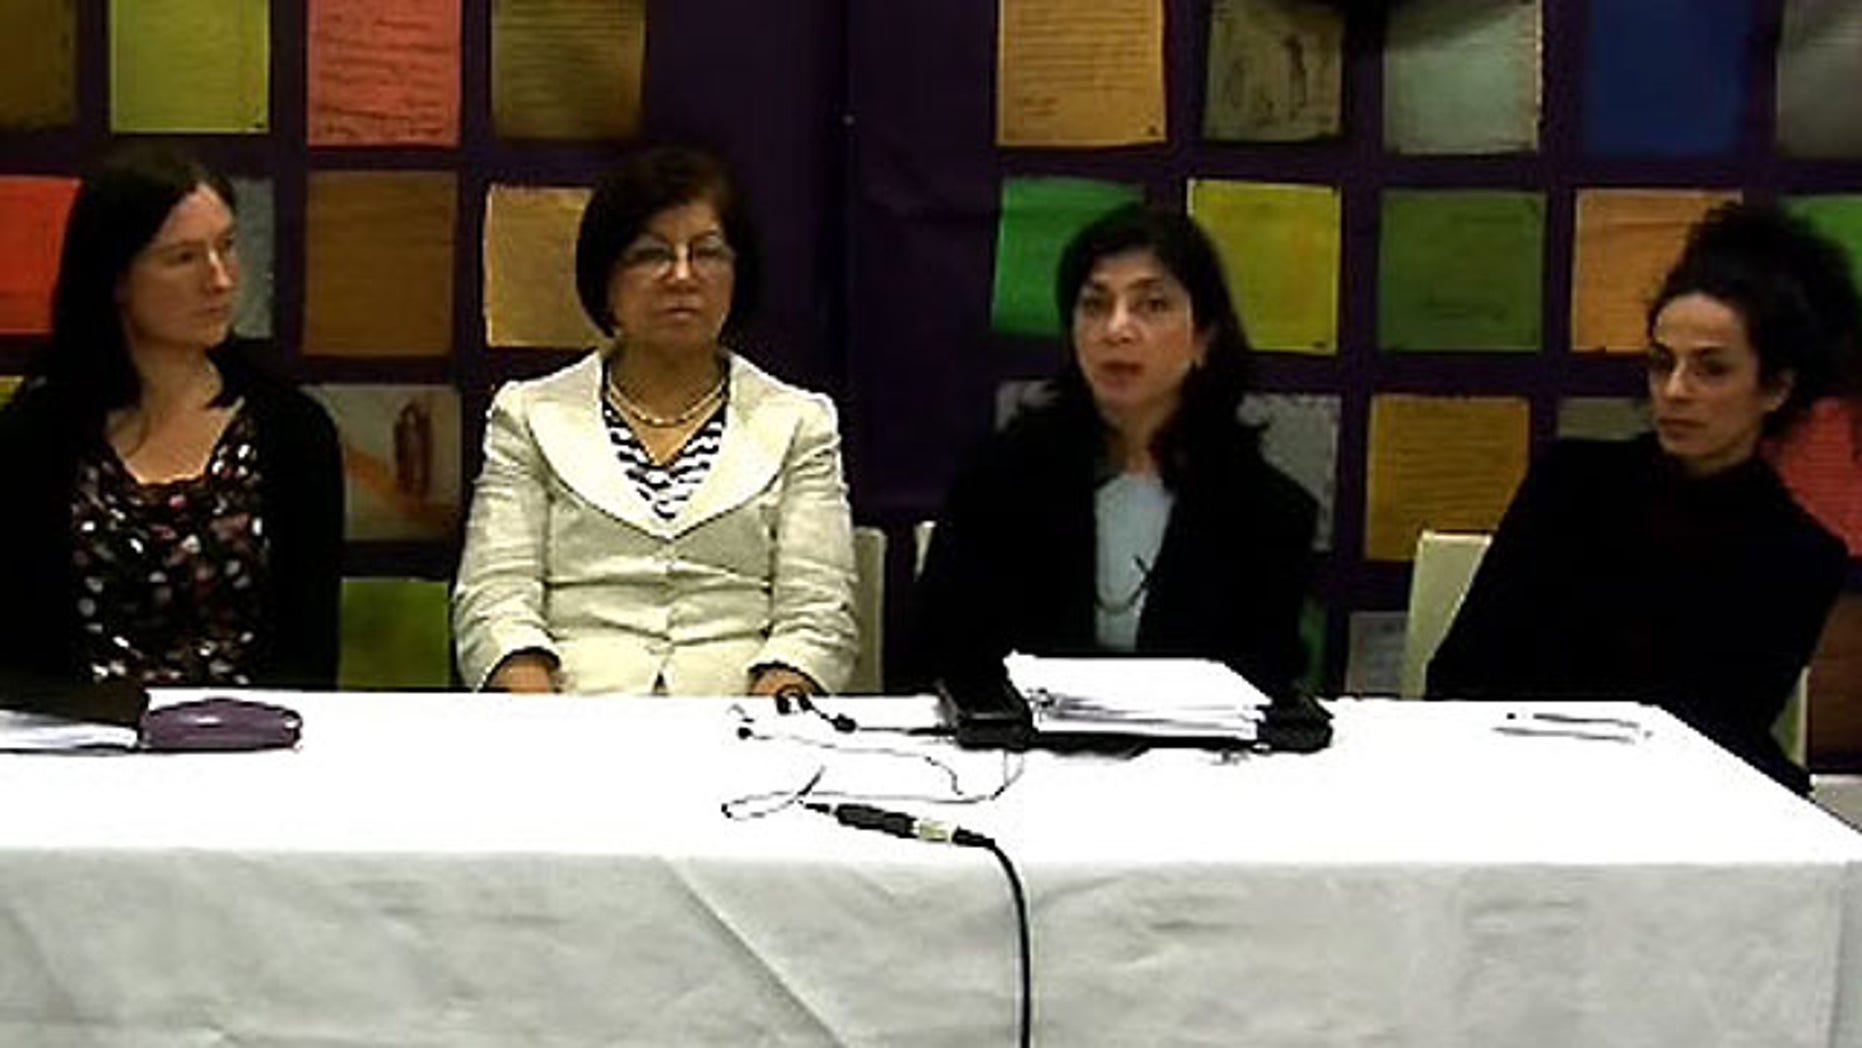 Panelists at last week's press conference discuss Iran's Family Protection Bill. From left: Ann Harrison, Amnesty International; Rouhi Shafii, International Coalition Against Violence in Iran; Roya Kashefi, Association des Chercheurs Iraniens; and journalist Masih Alinejad.